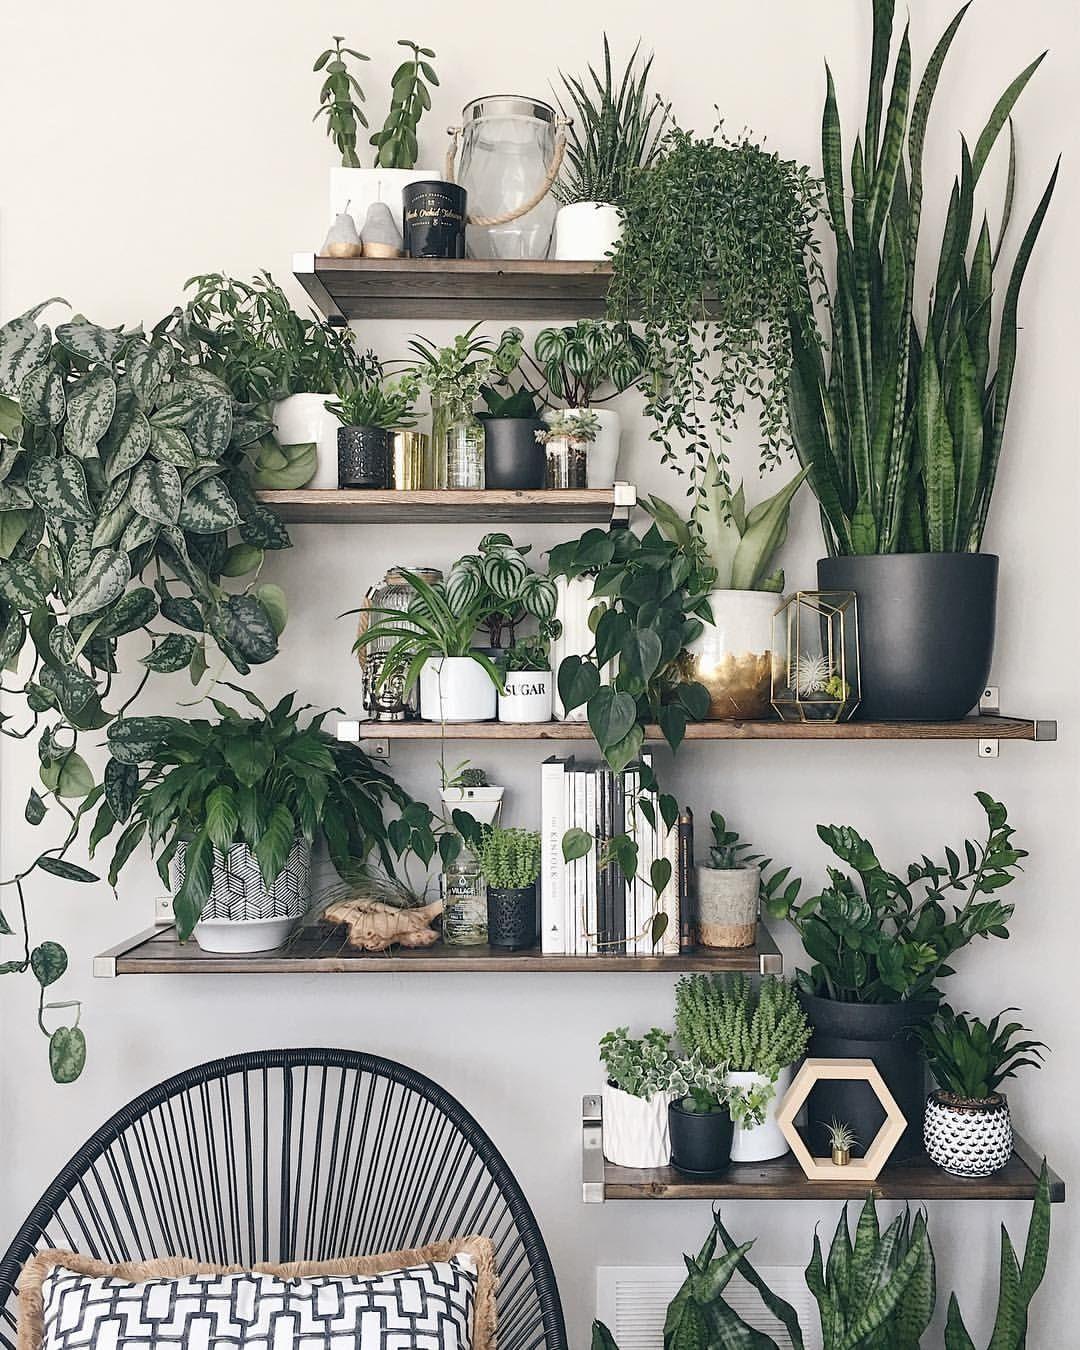 That's a beautiful indoor jungle! #houseplants | Boho master bedroom,  Simple apartment decor, Plant decor